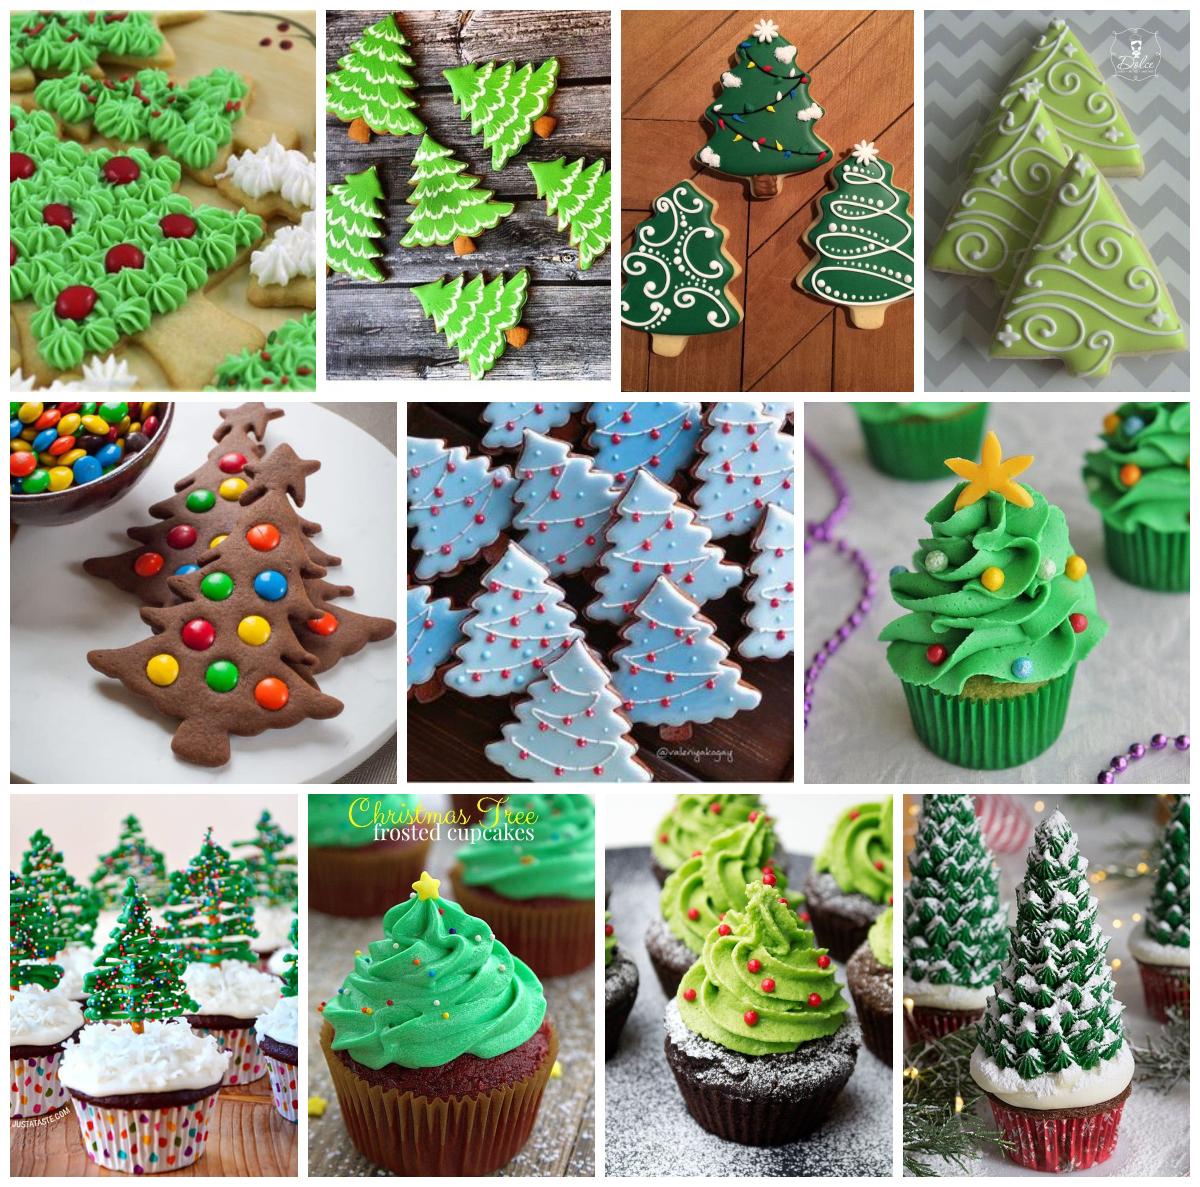 mezeskalacs_muffin_cupcake_sutemeny_diszites_dekoracio_karacsonyi_sutemeny_suti_desszert_otlet.jpg